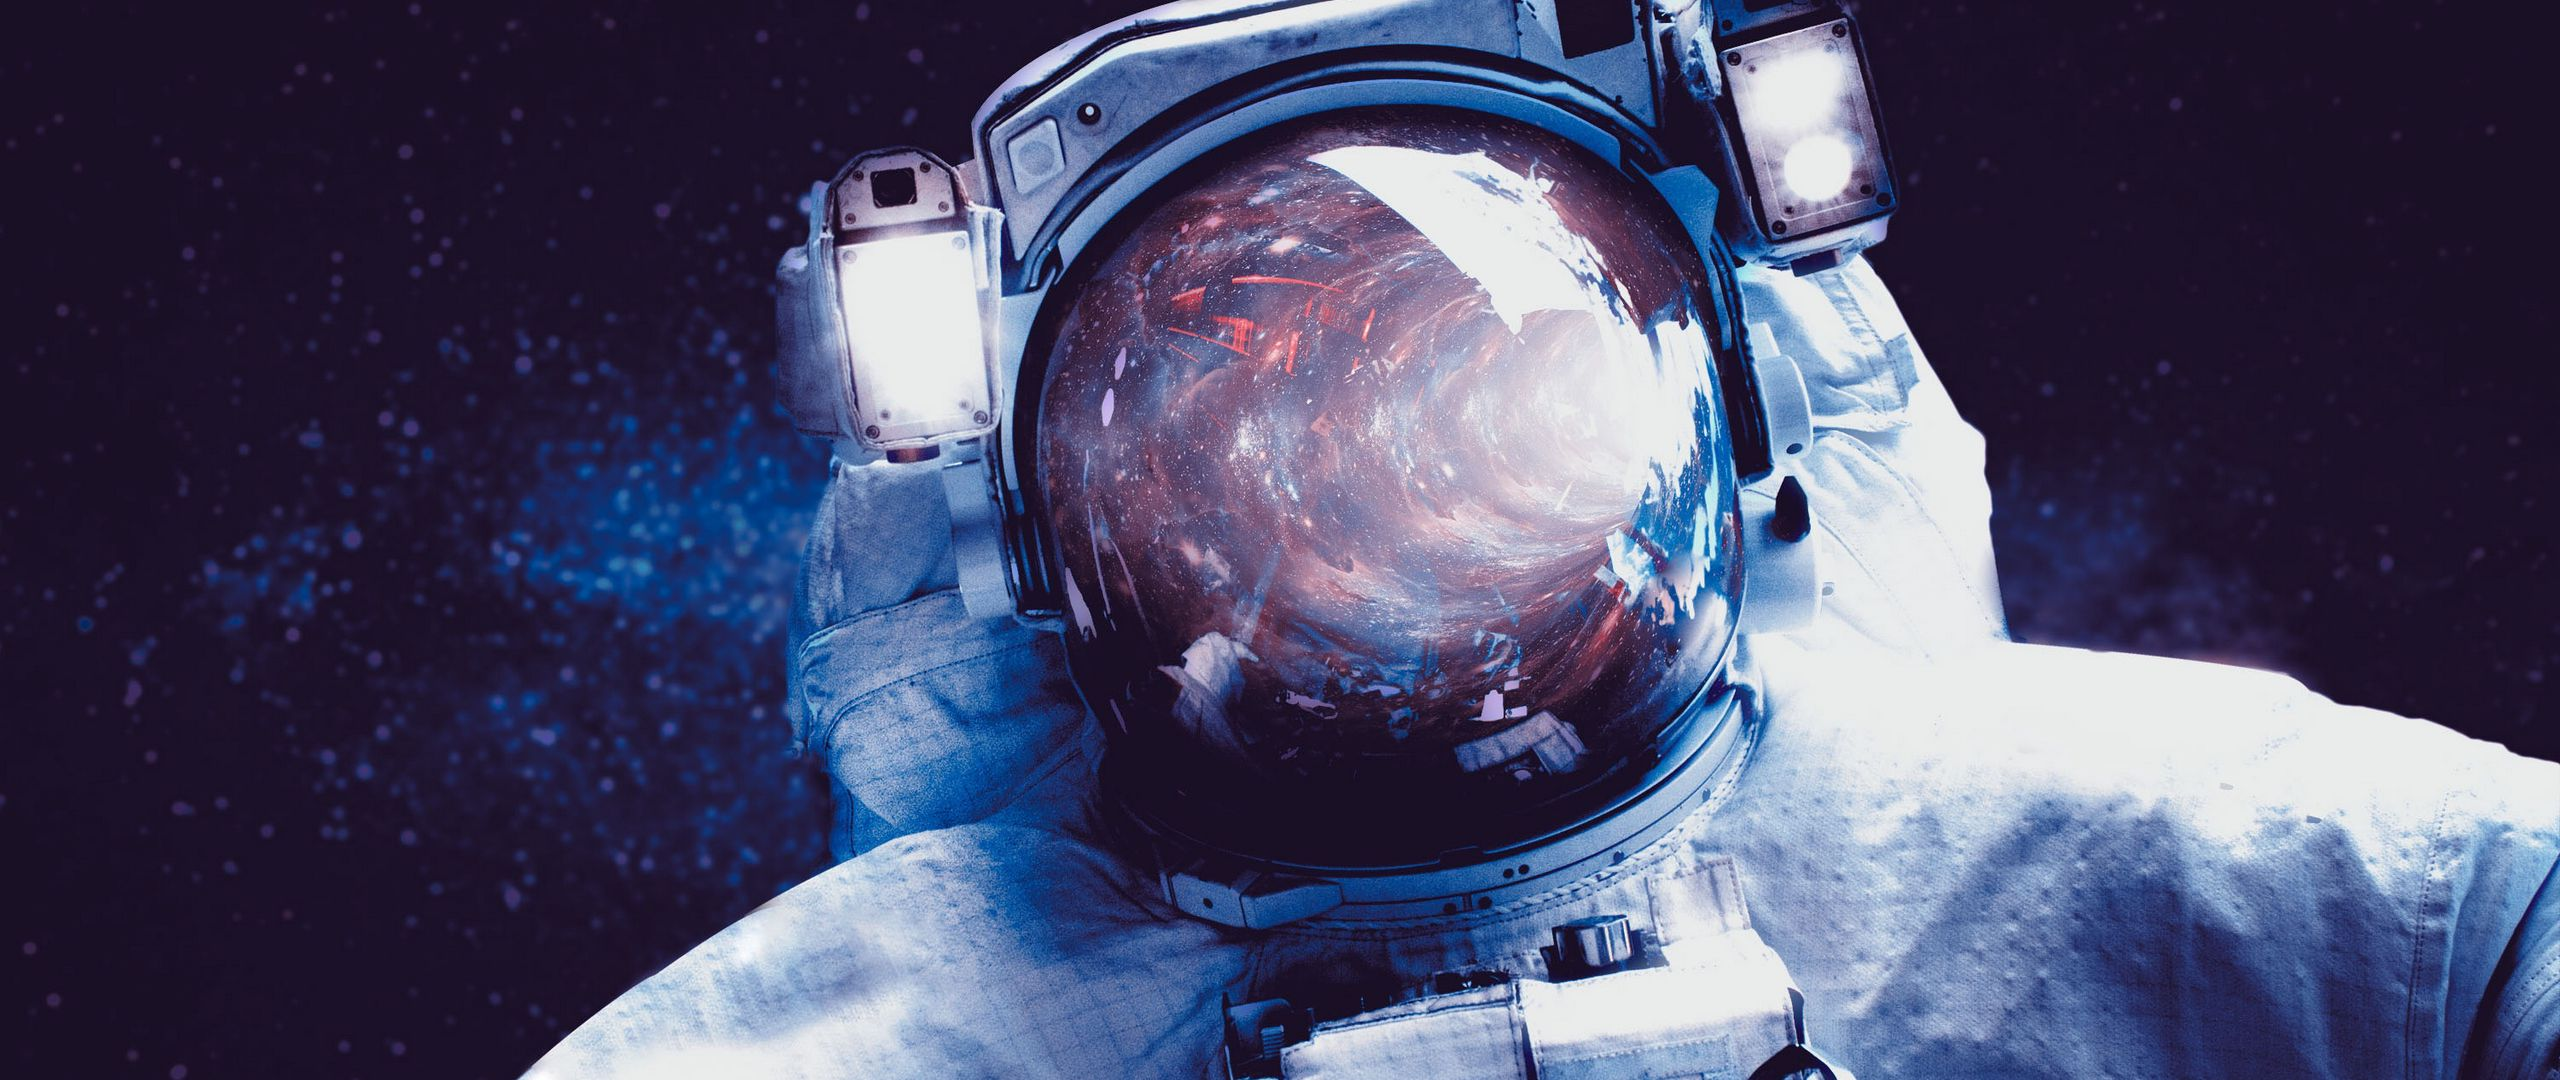 Fondos de pantalla Astronauta con espacio reflejado en casco